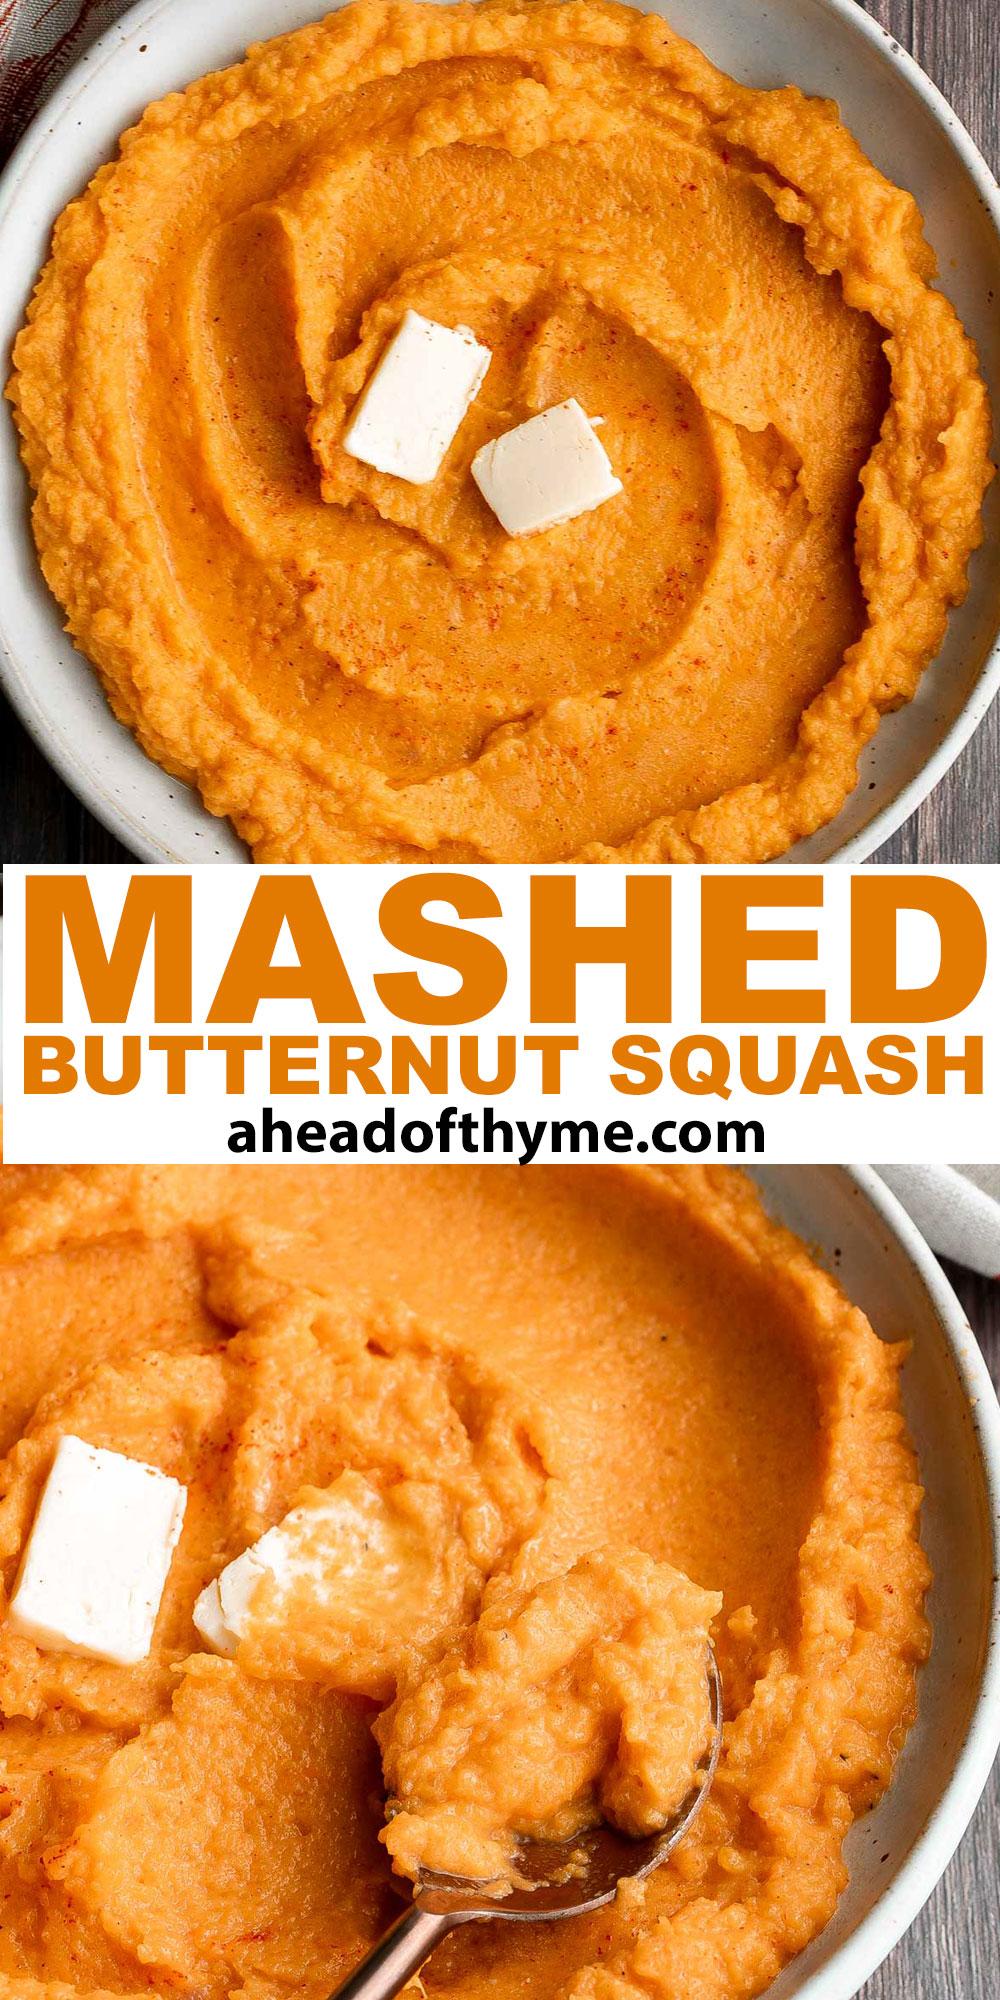 Mashed Butternut Squash